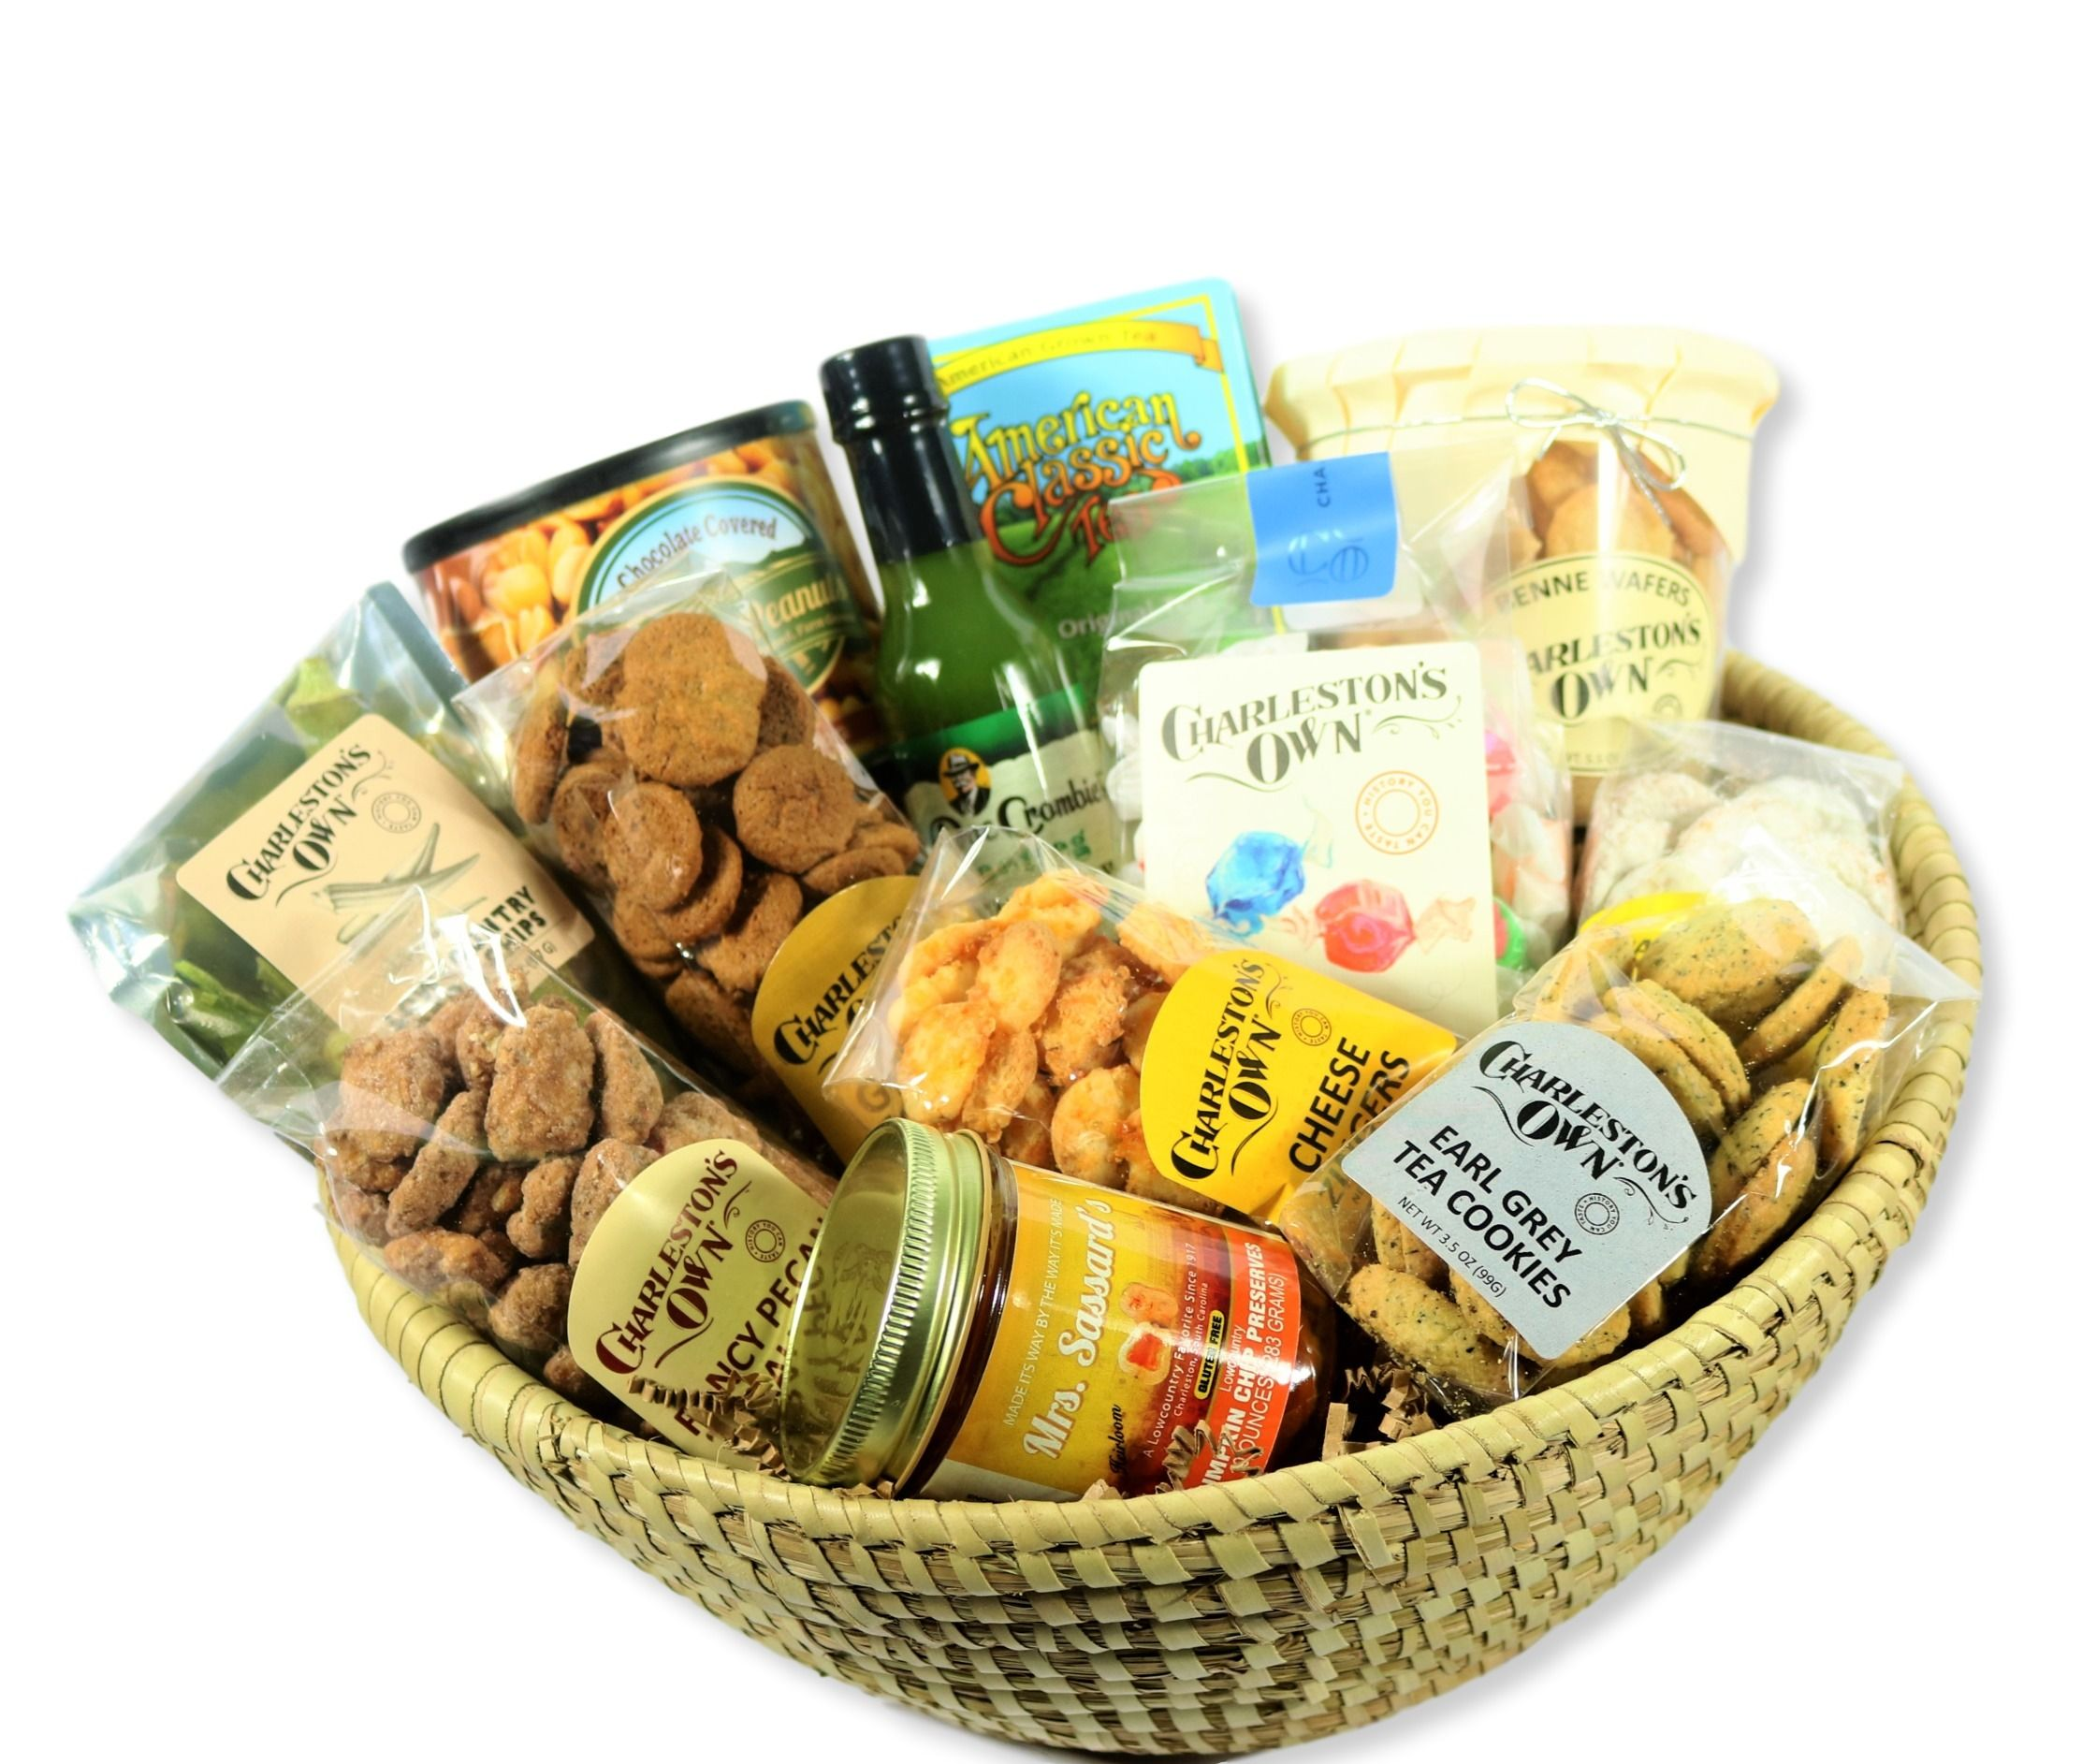 Custom Gift Basket with local South Carolina food items.